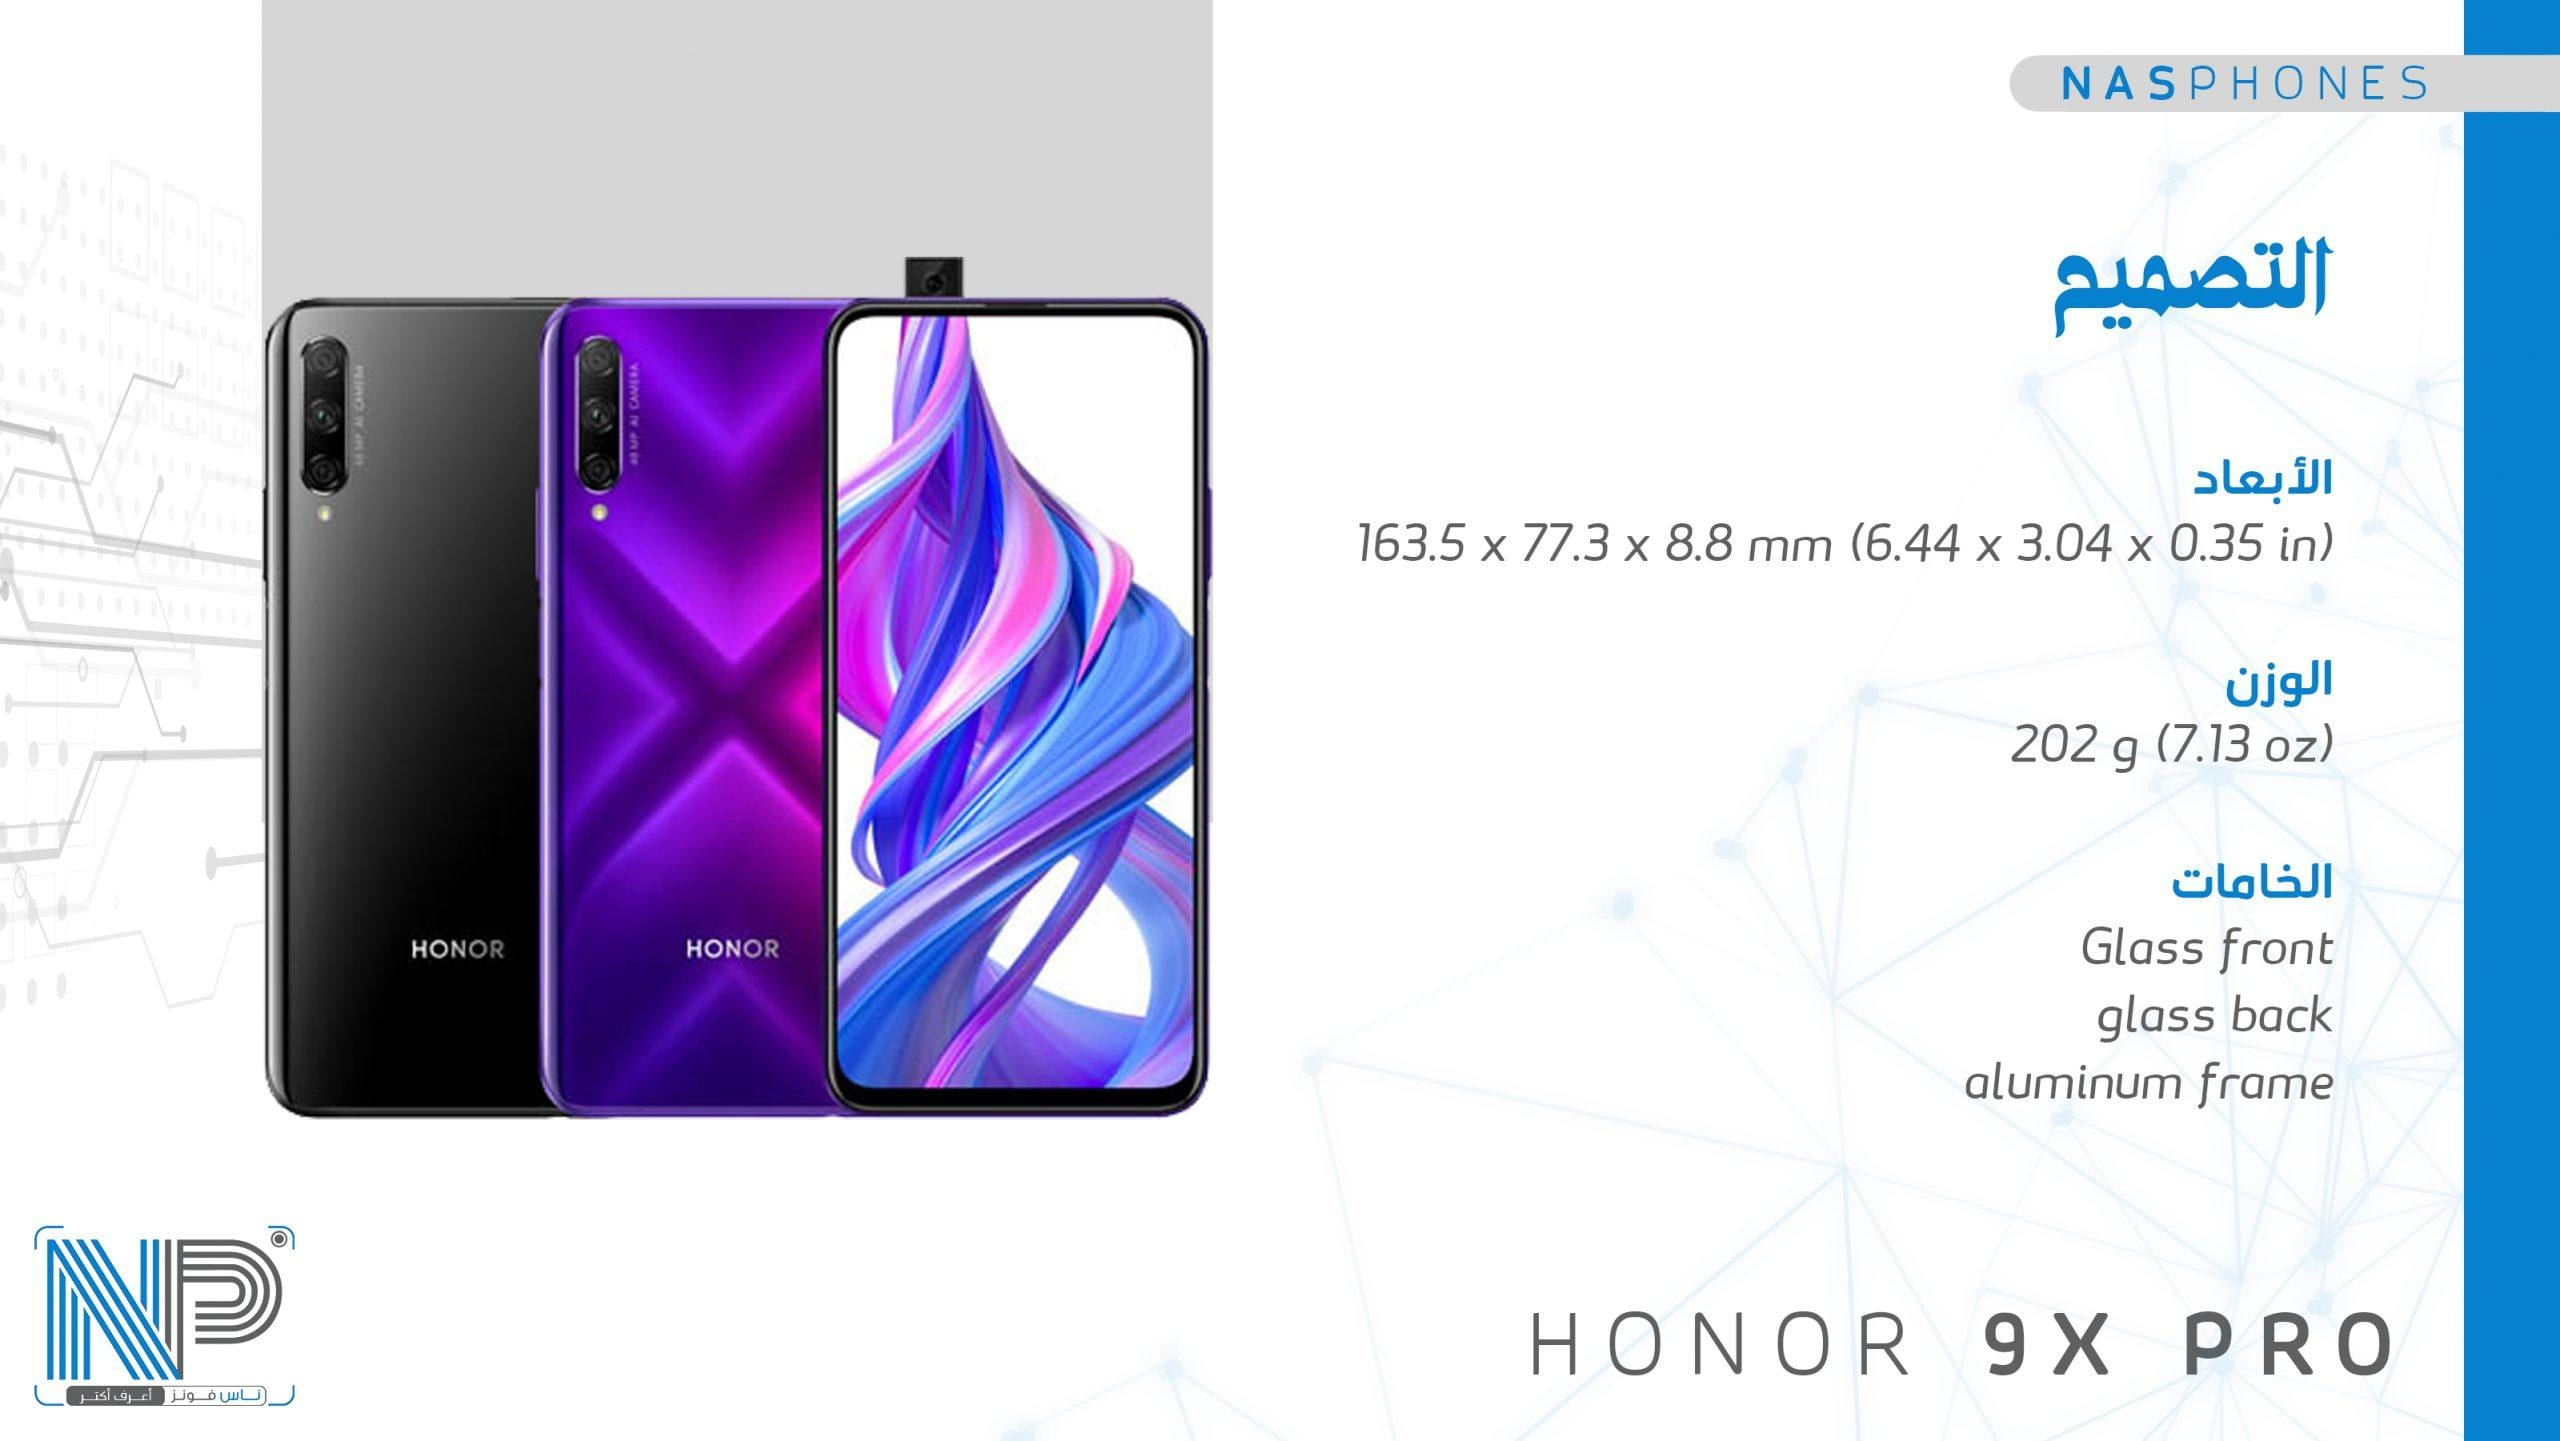 تصميم موبايل Honor 9X Pro